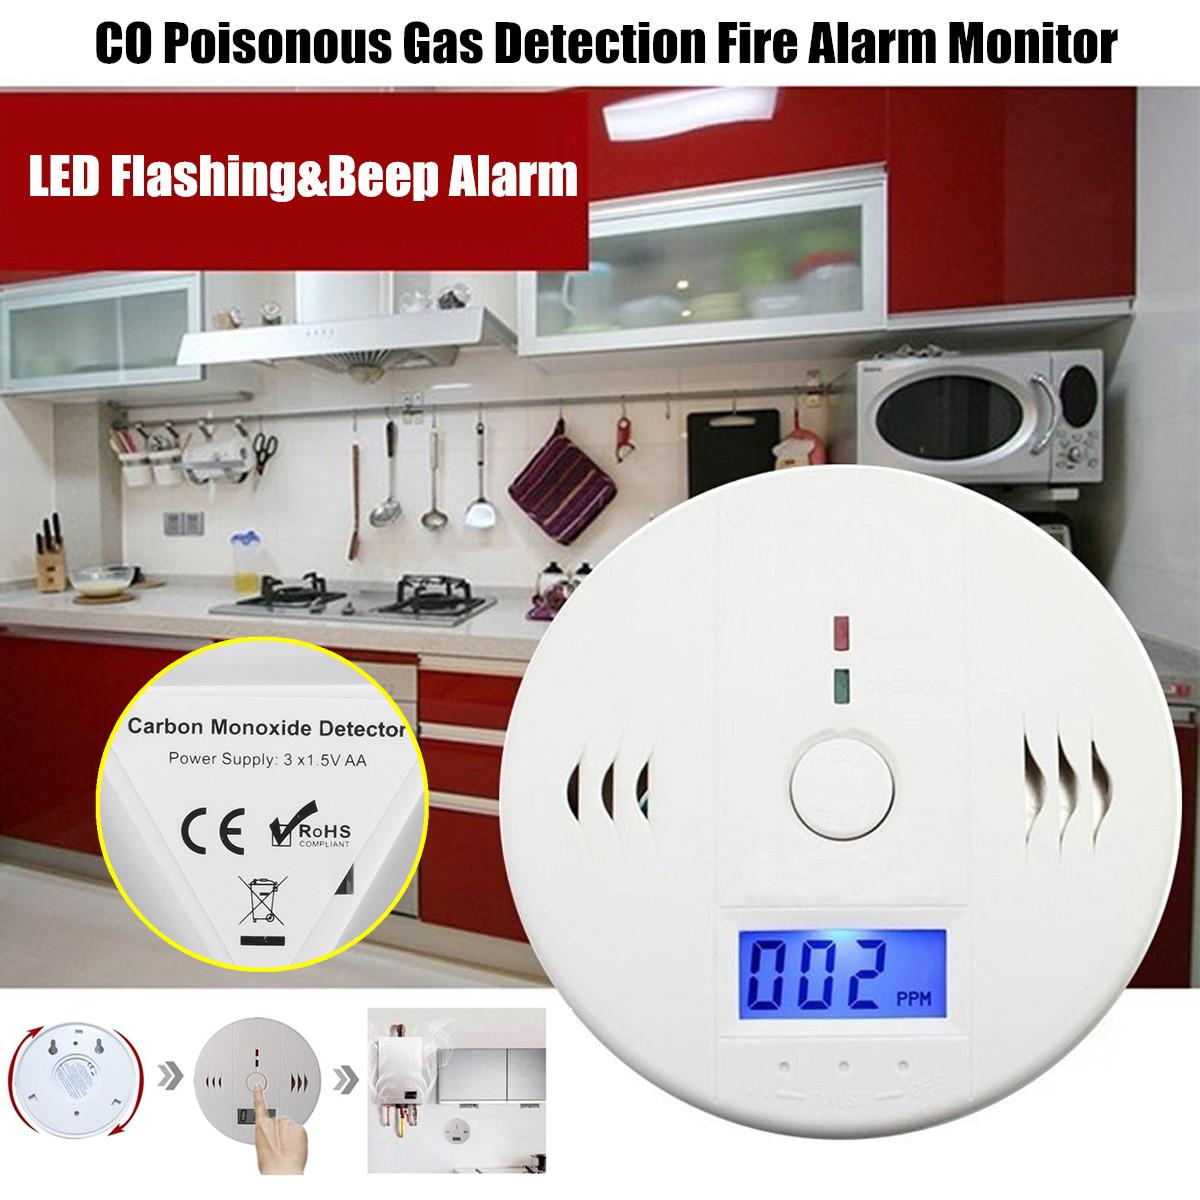 Digital Display Safety CO Carbon Monoxide Kitchen & Dining Gas Fire Sensor LED Flashing&Beep Alarm Detectors Monitor Sensor Alert Warning Detector Tester Poisonous Gas Detection Alarm Battery